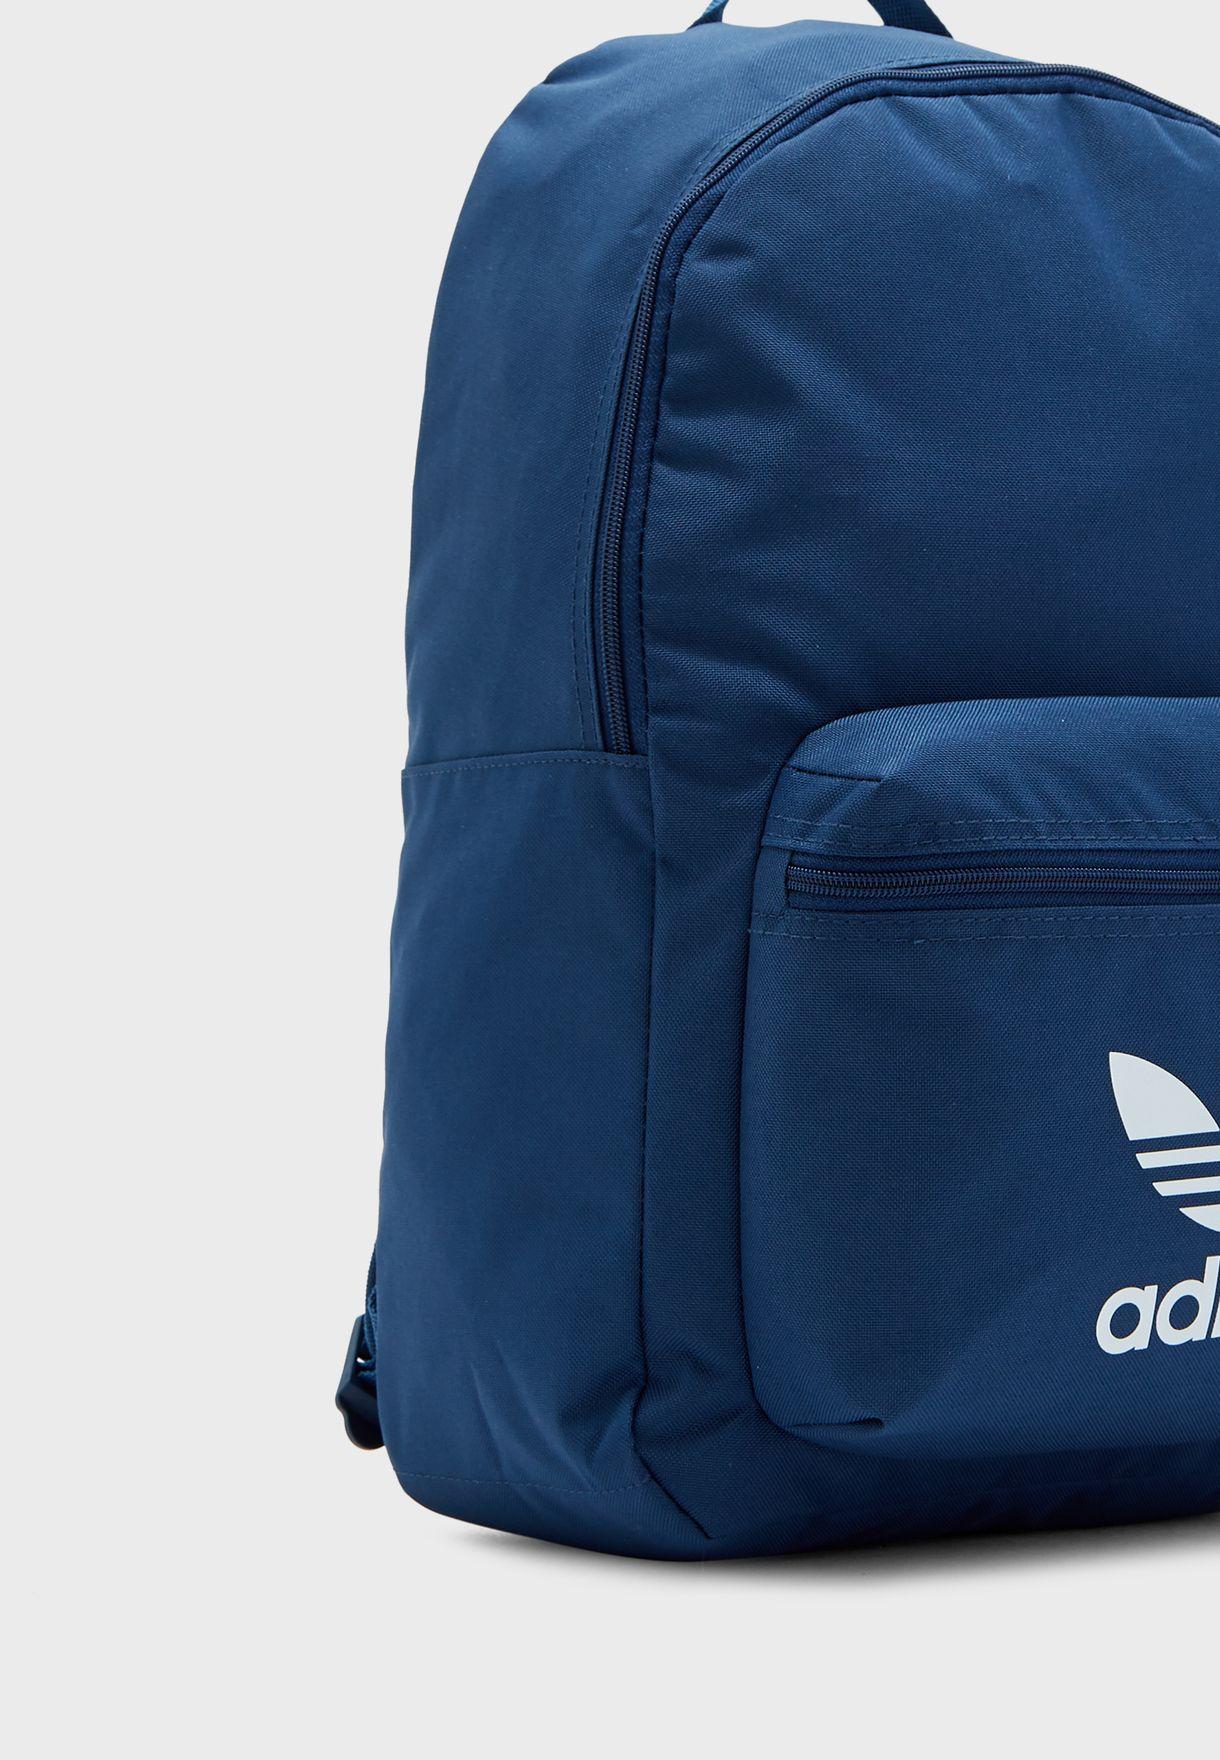 adicolor Classics Backpack